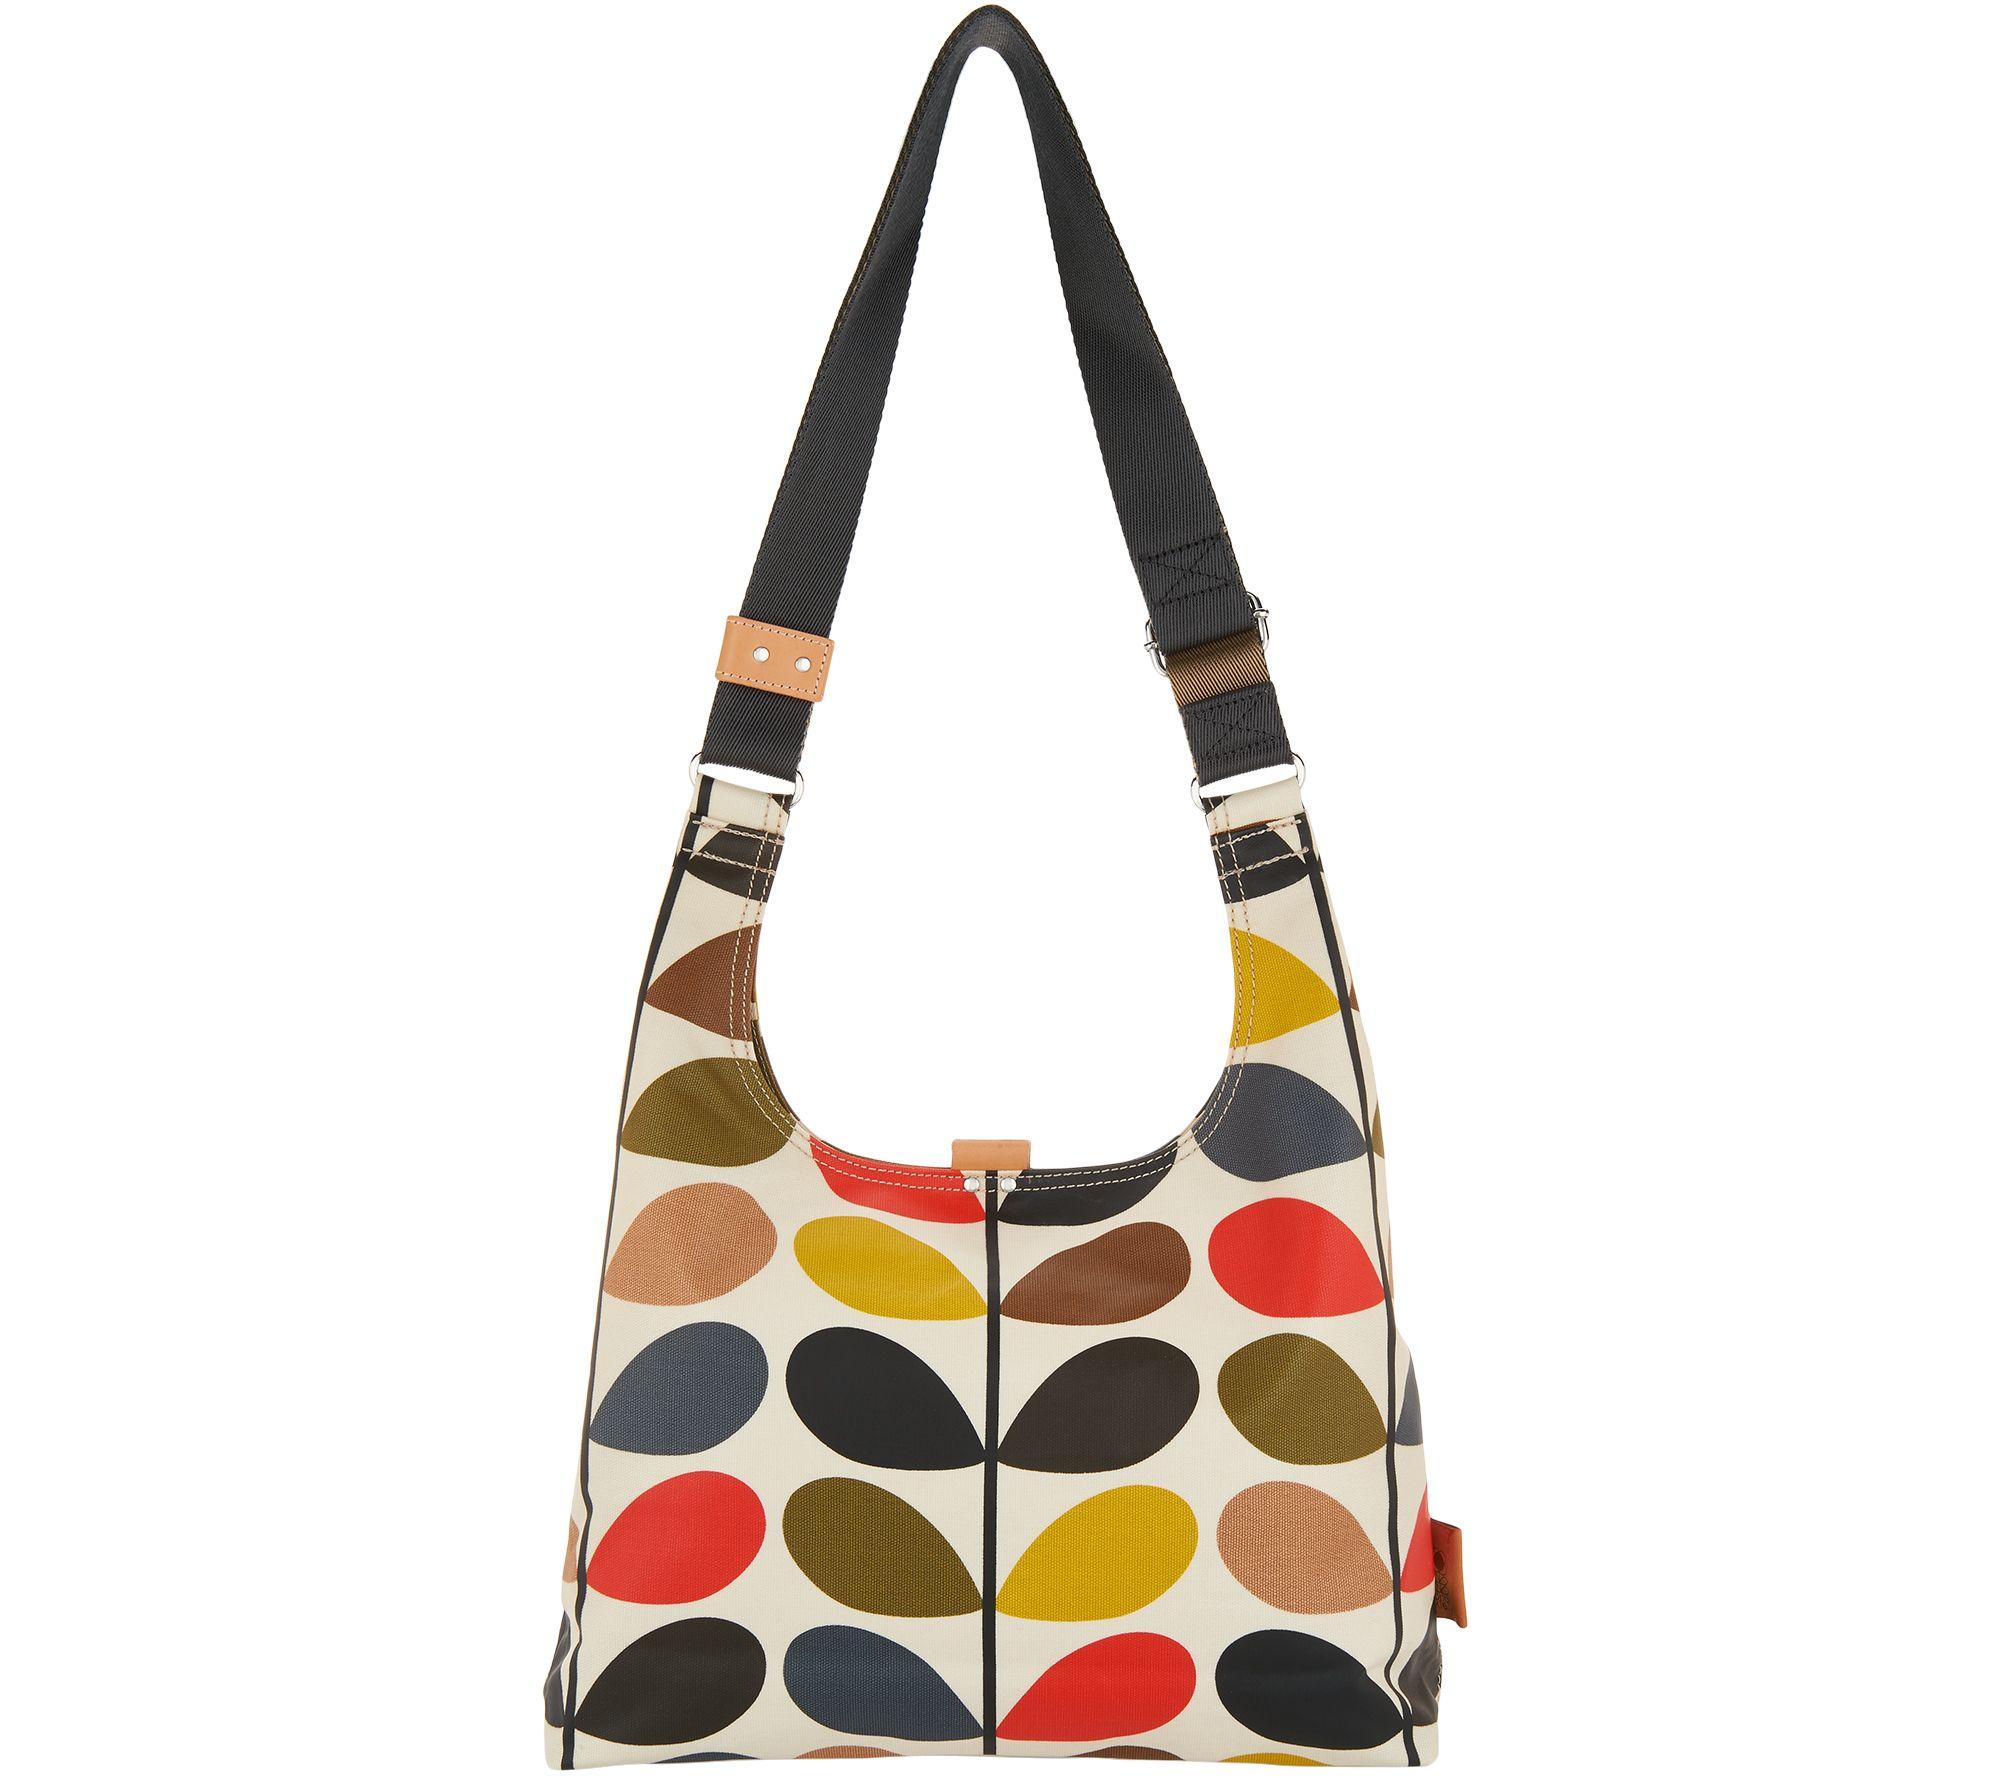 Orla Kiely Coated Canvas Midi Sling Bag - Page 1 — QVC.com